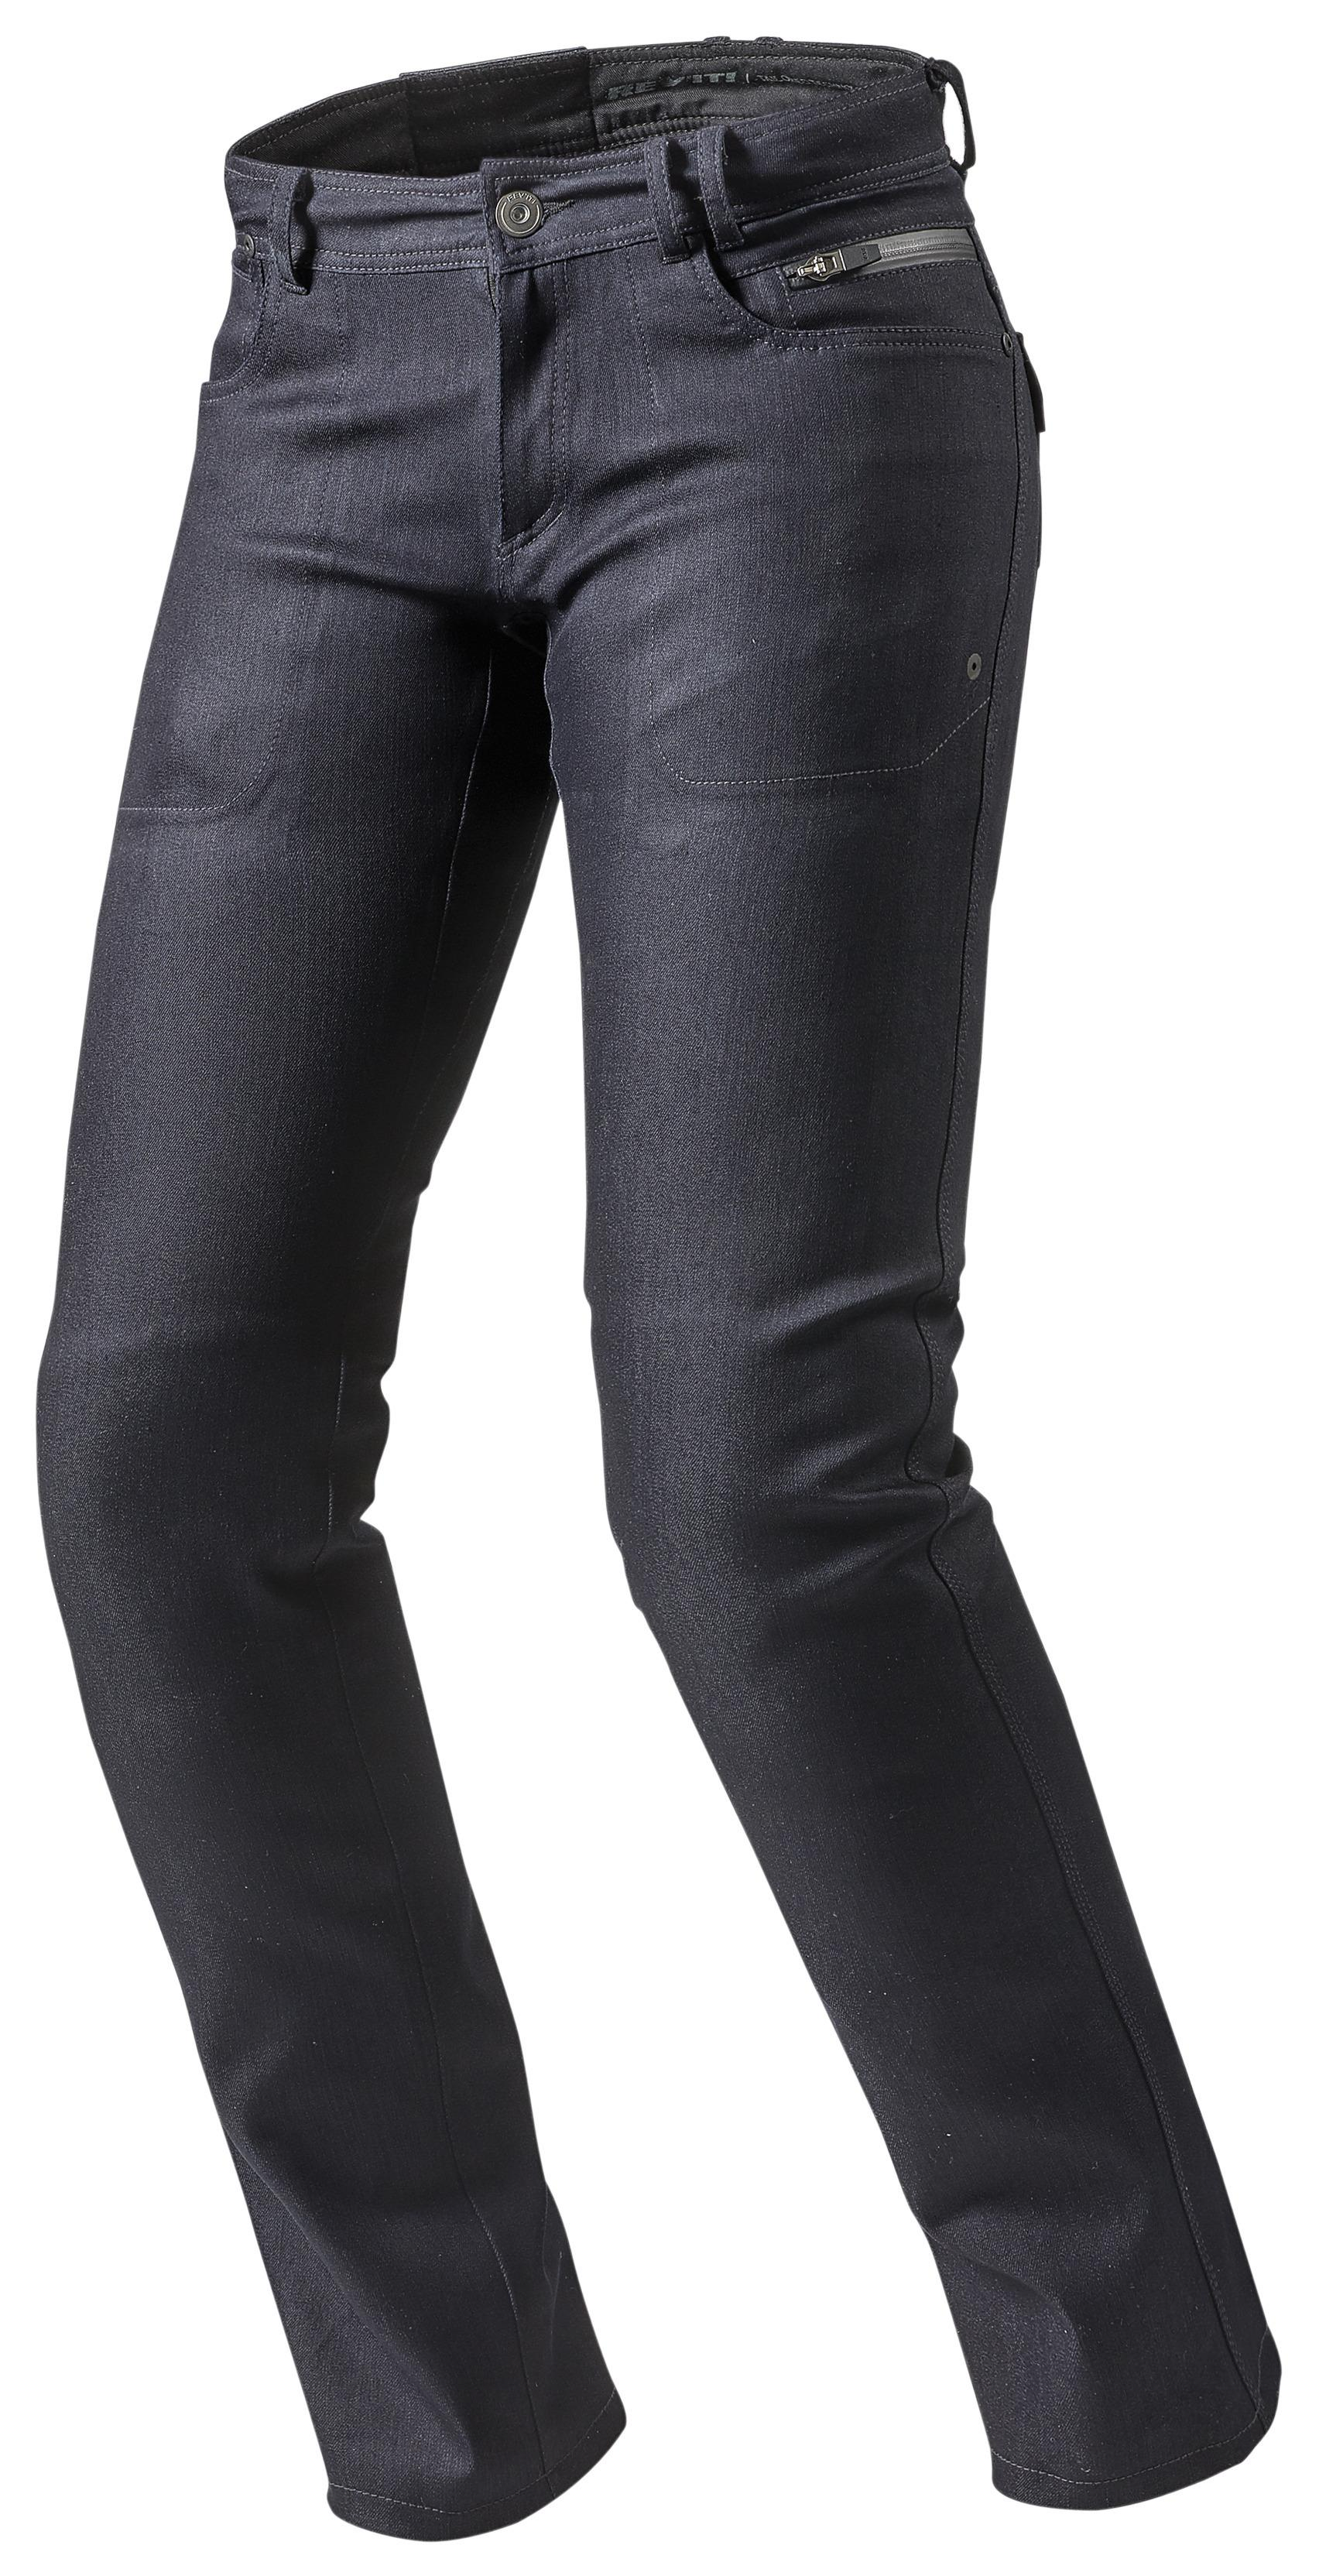 REV IT ORLANDO H2O L32 Woman Motorcycle Jeans Dark Blue